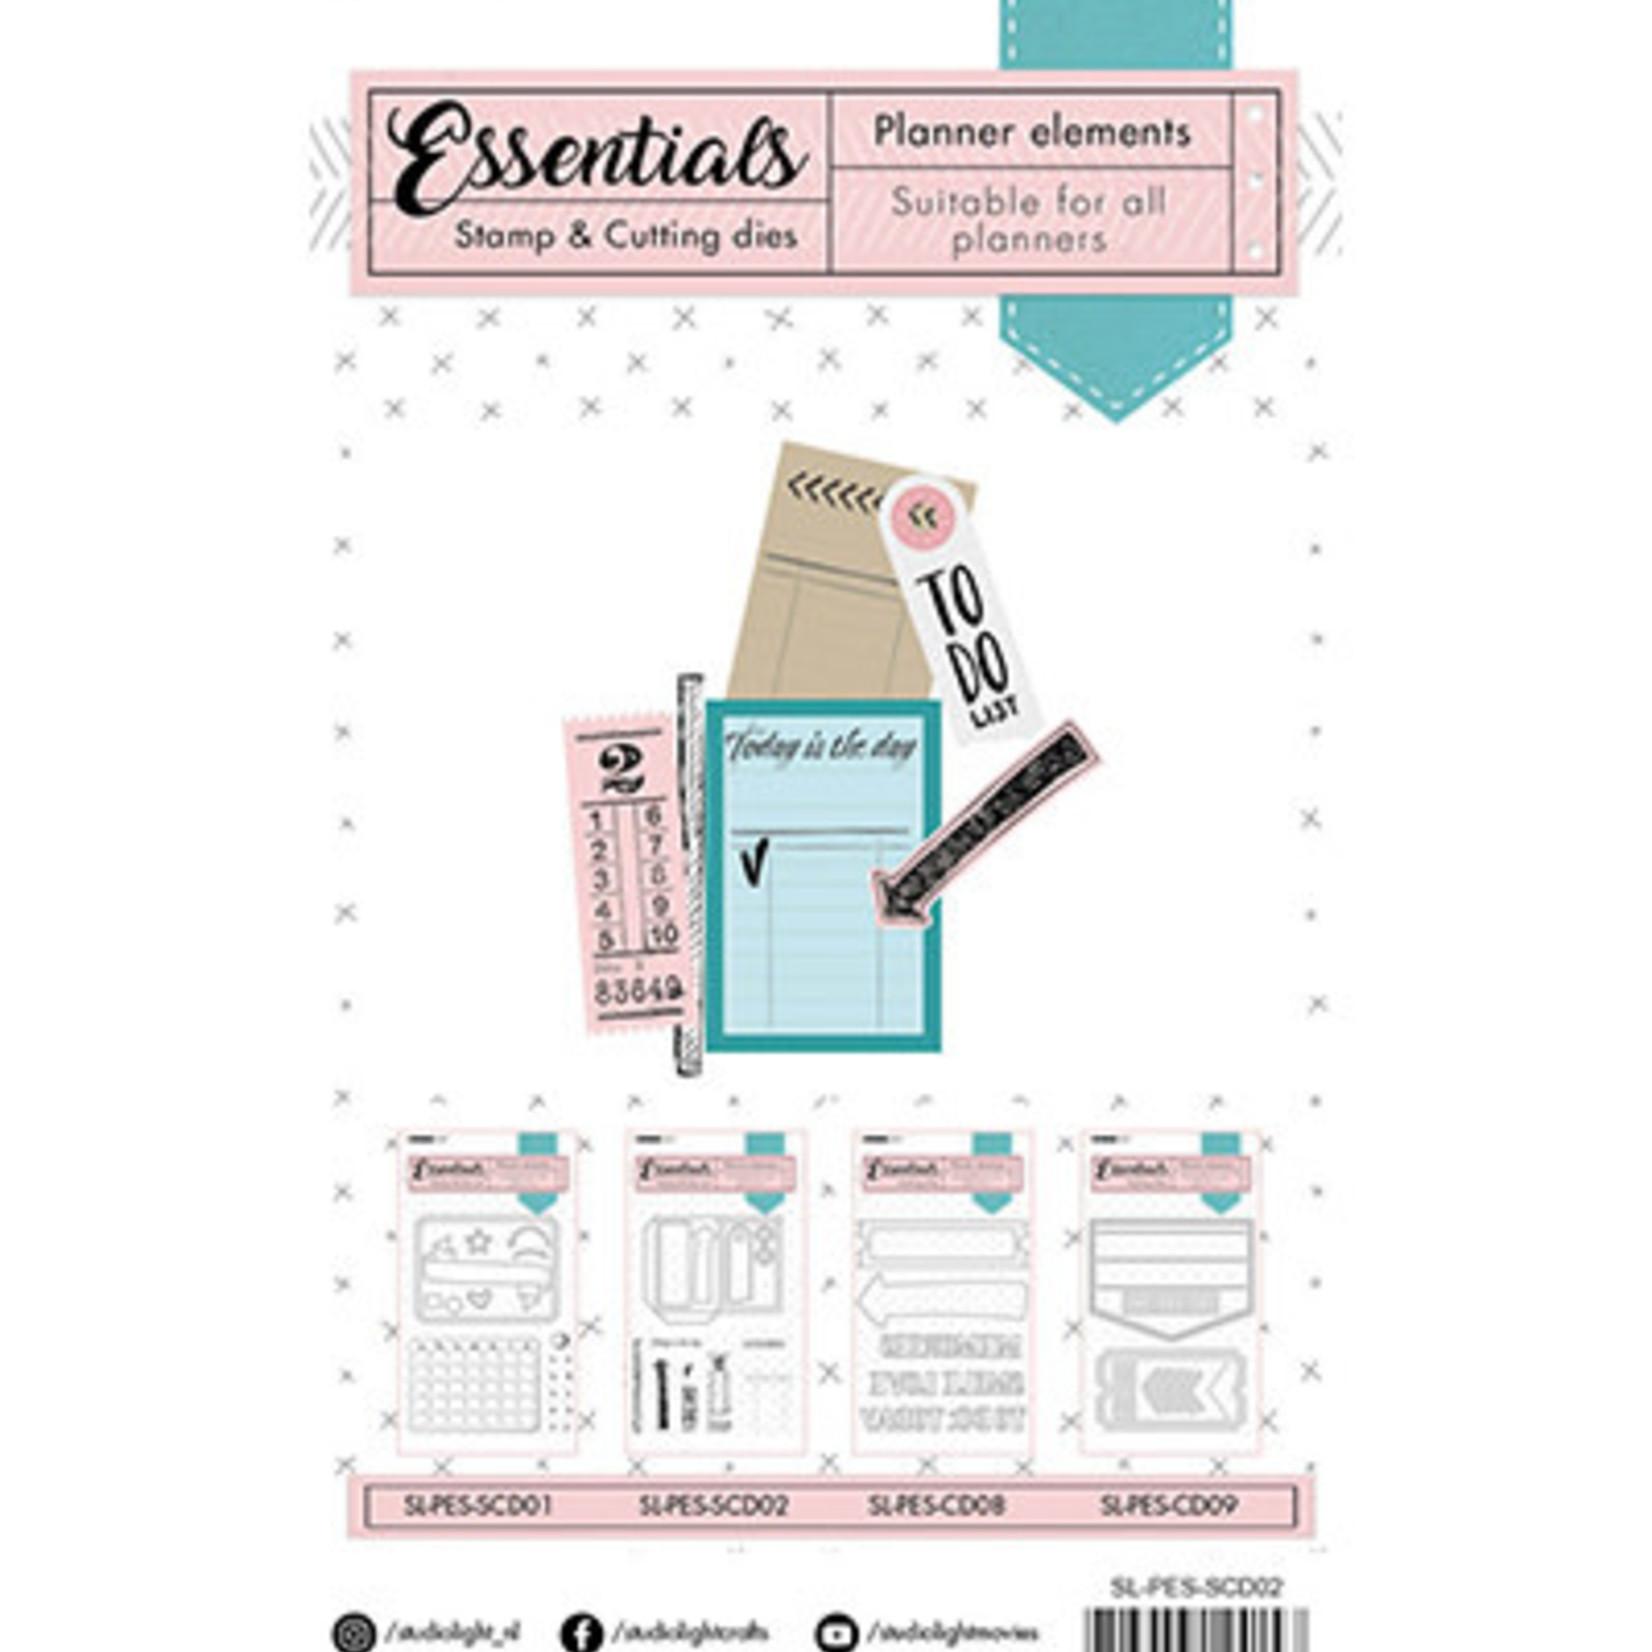 Studio Light Studio Light - Essentials Stamp & Cutting Dies - Planner Elements - SL-PES-SCD02